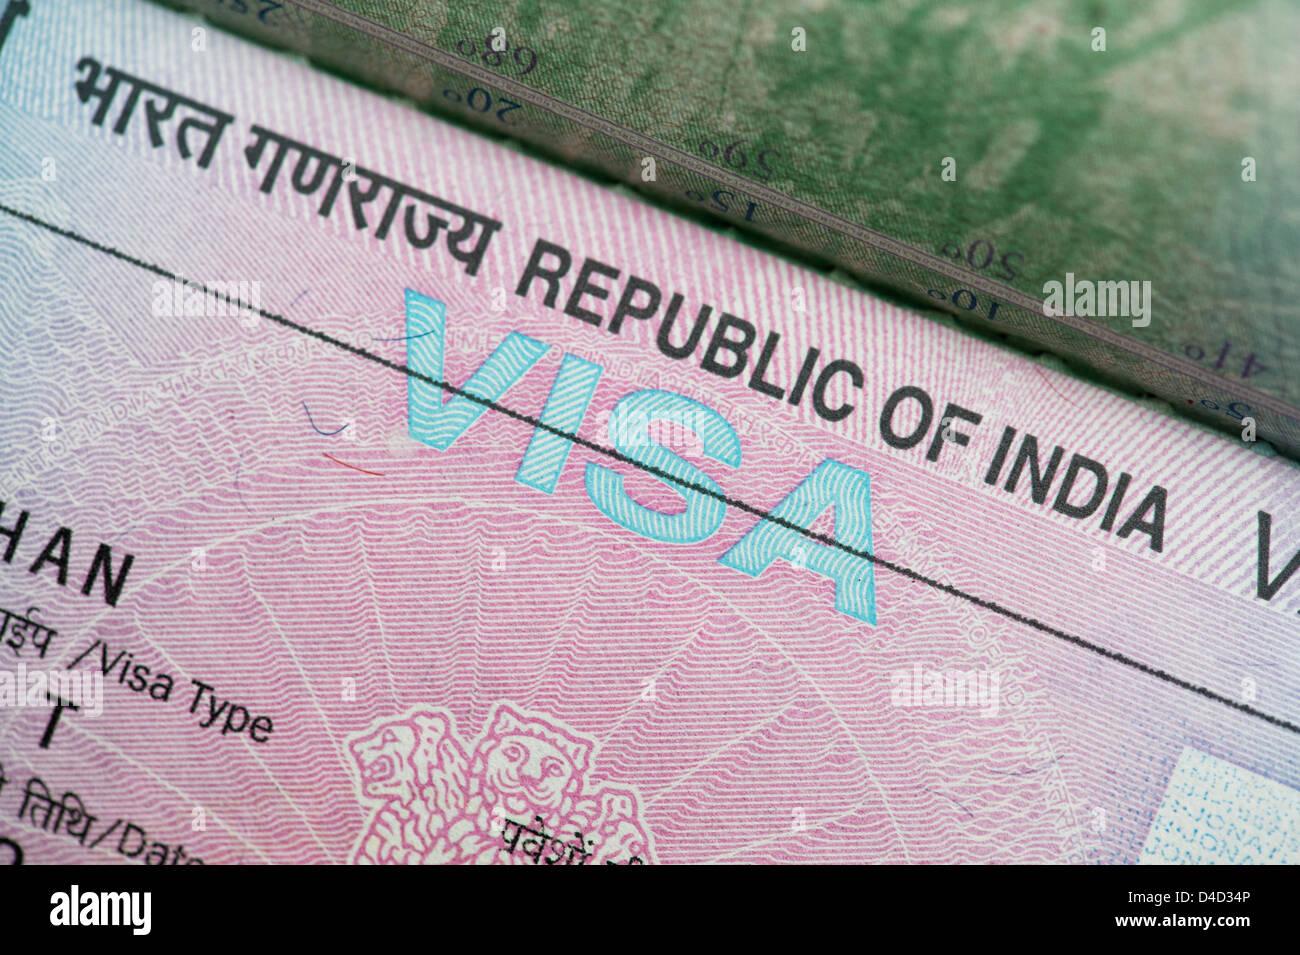 Indian visa in a British passport Stock Photo